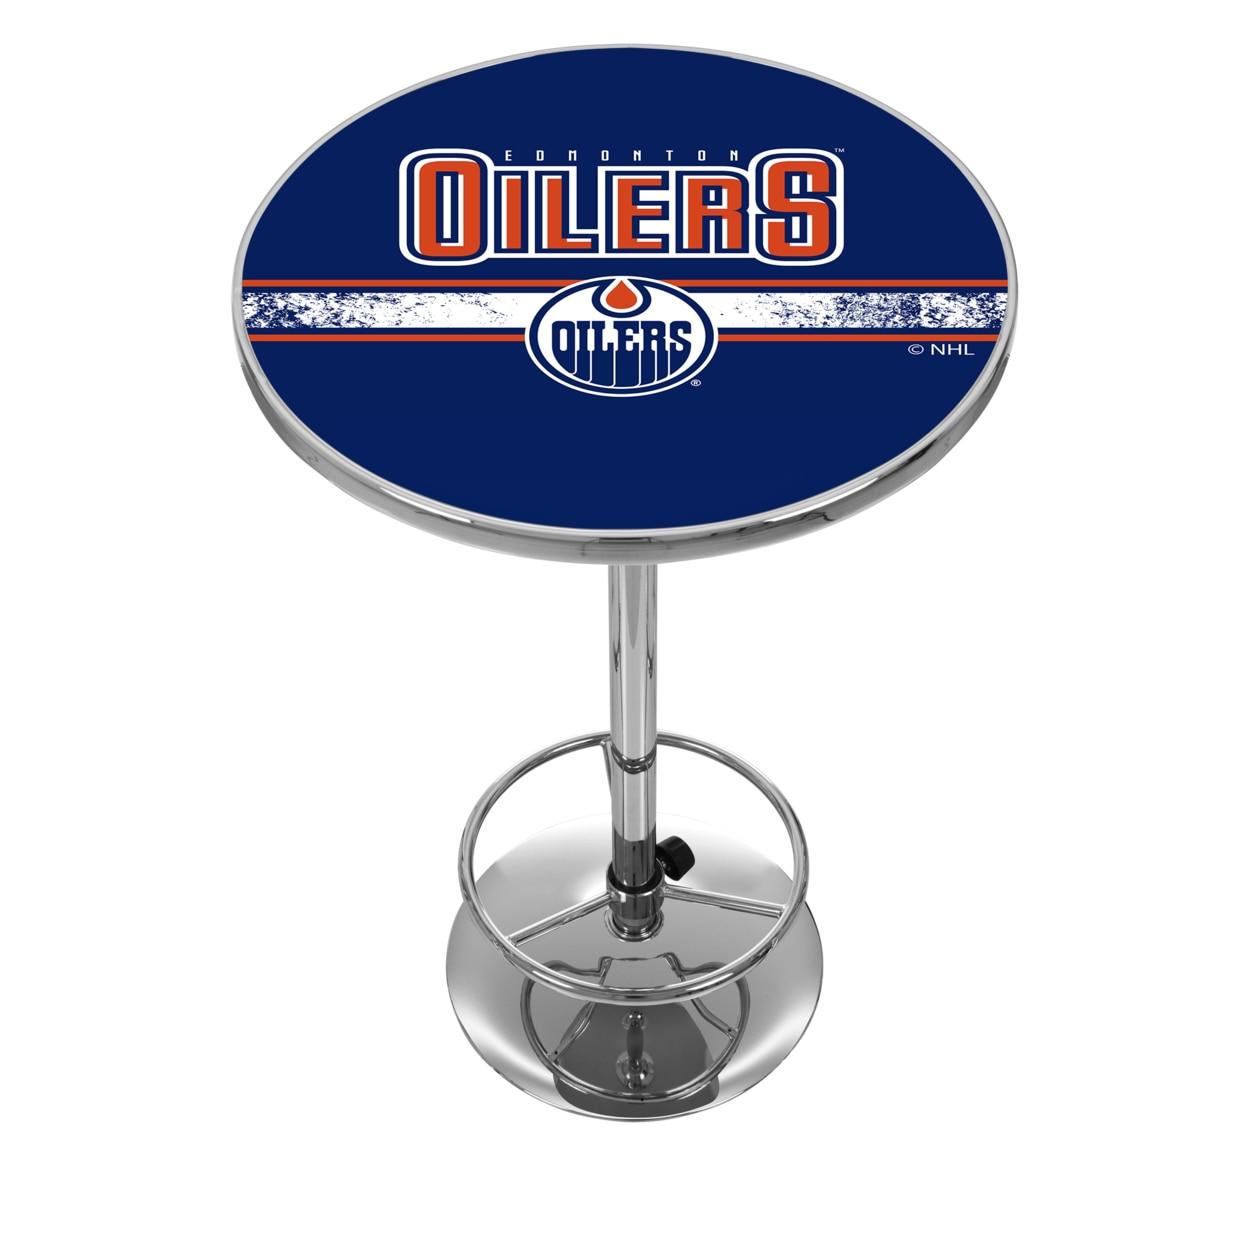 NHL Chrome 42 Inch Pub Table - Edmonton Oilers hunter mfg 3 4 inch edmonton oilers adjustable harness medium